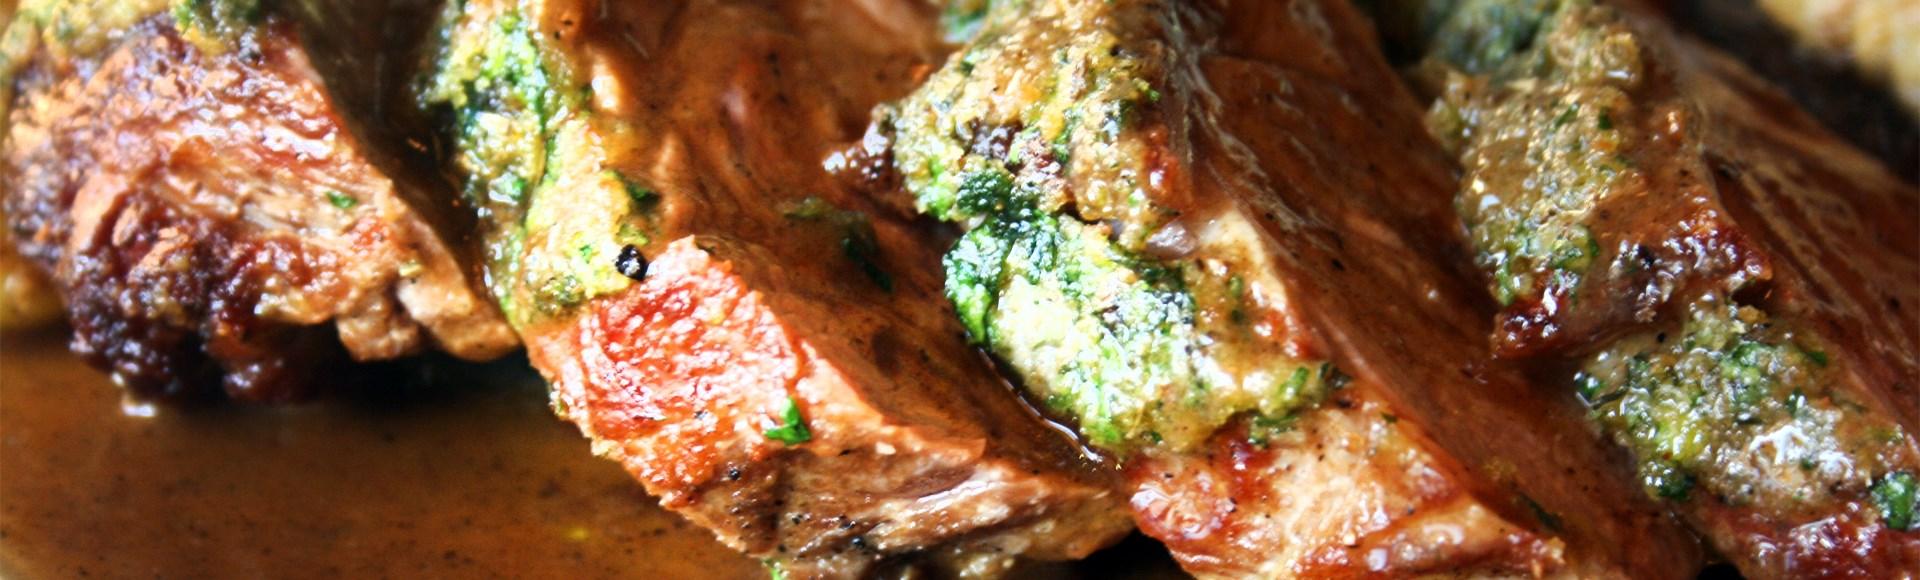 antonis-stavros-chania-crete-greece-21 - Chef Antonis & Stavros - Chania, Kreta, Hellas - Alargo | Håndplukkede ferieboliger på Kreta, Korfu og Paros